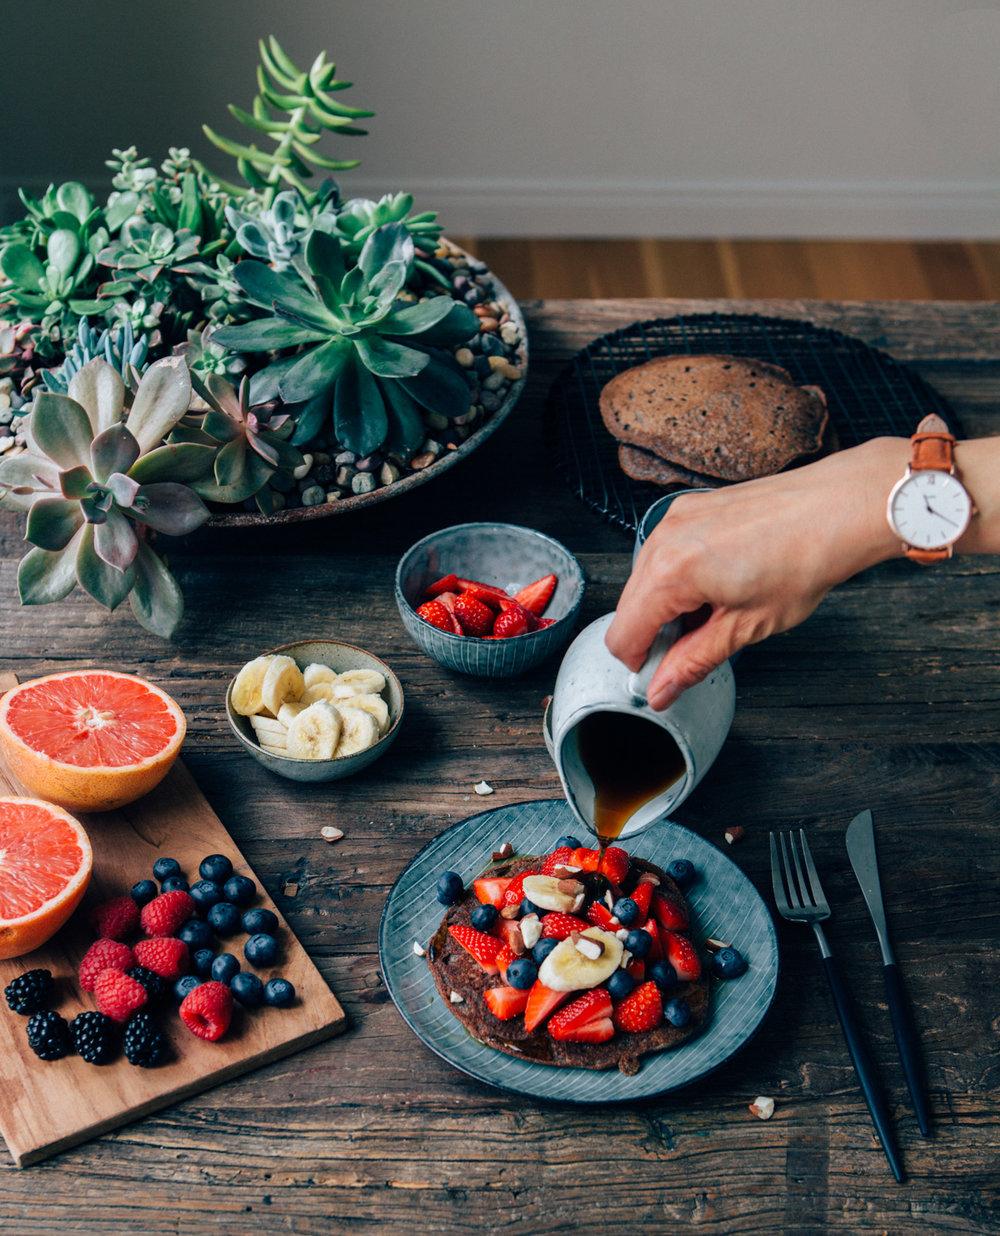 Vegan Gluten-free Buckwheat Hotcakes by @lumadeline